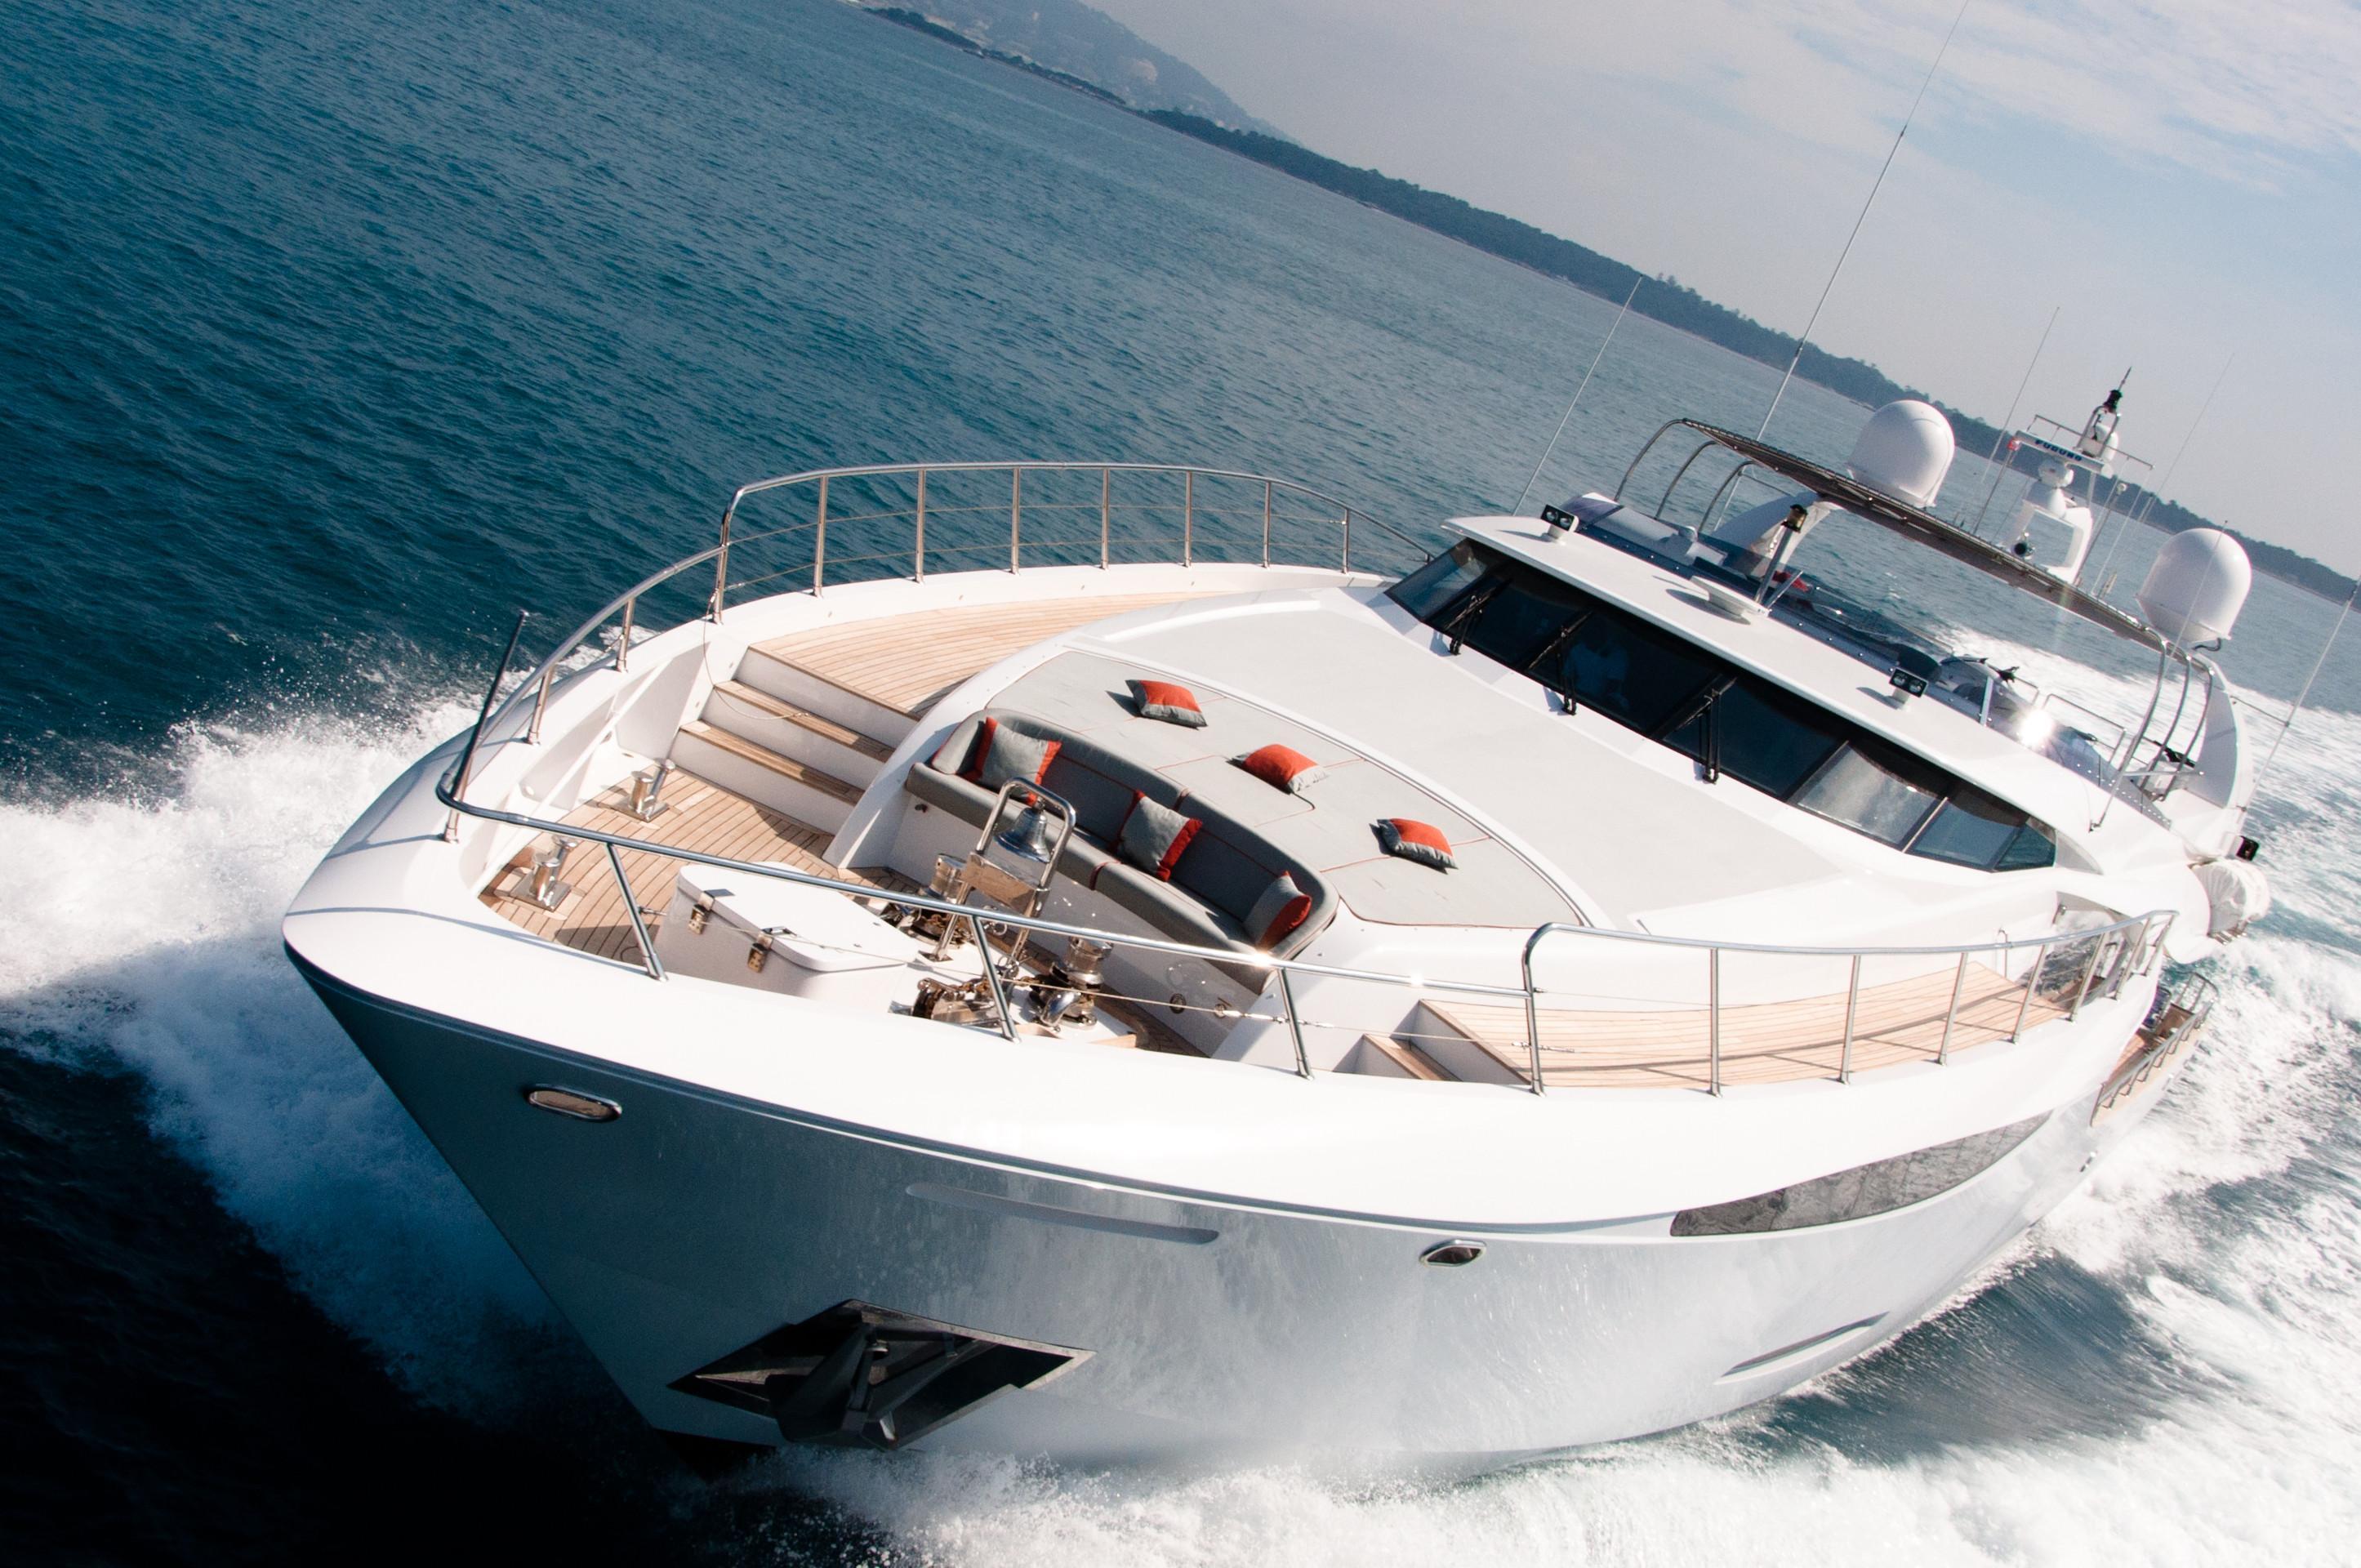 GEMS - Spped yacht